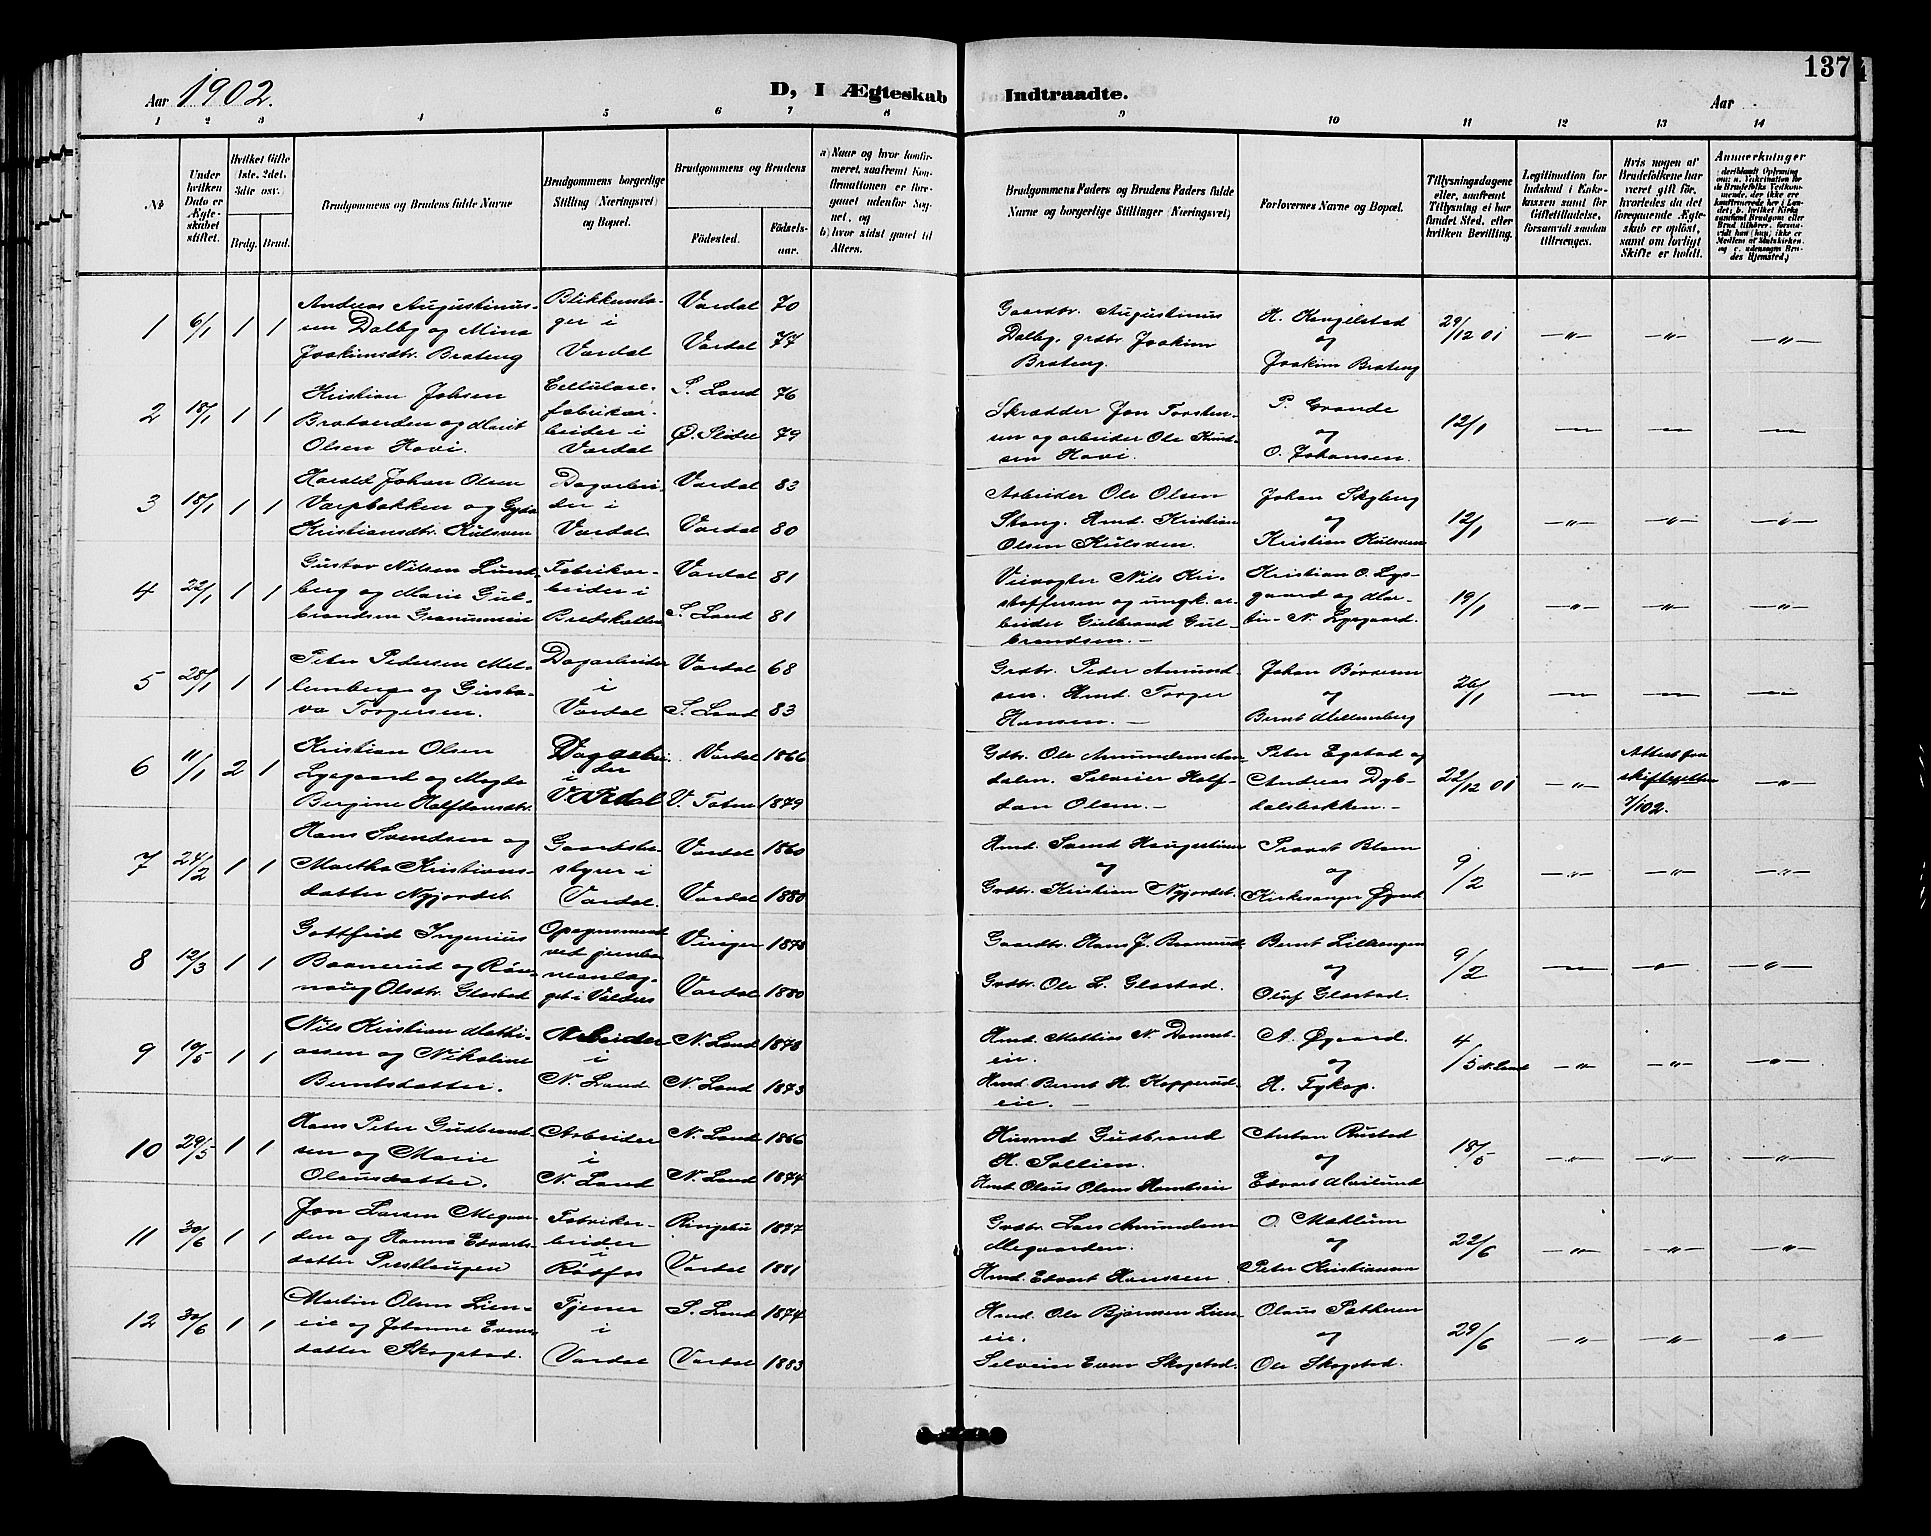 SAH, Vardal prestekontor, H/Ha/Hab/L0011: Klokkerbok nr. 11, 1899-1913, s. 137